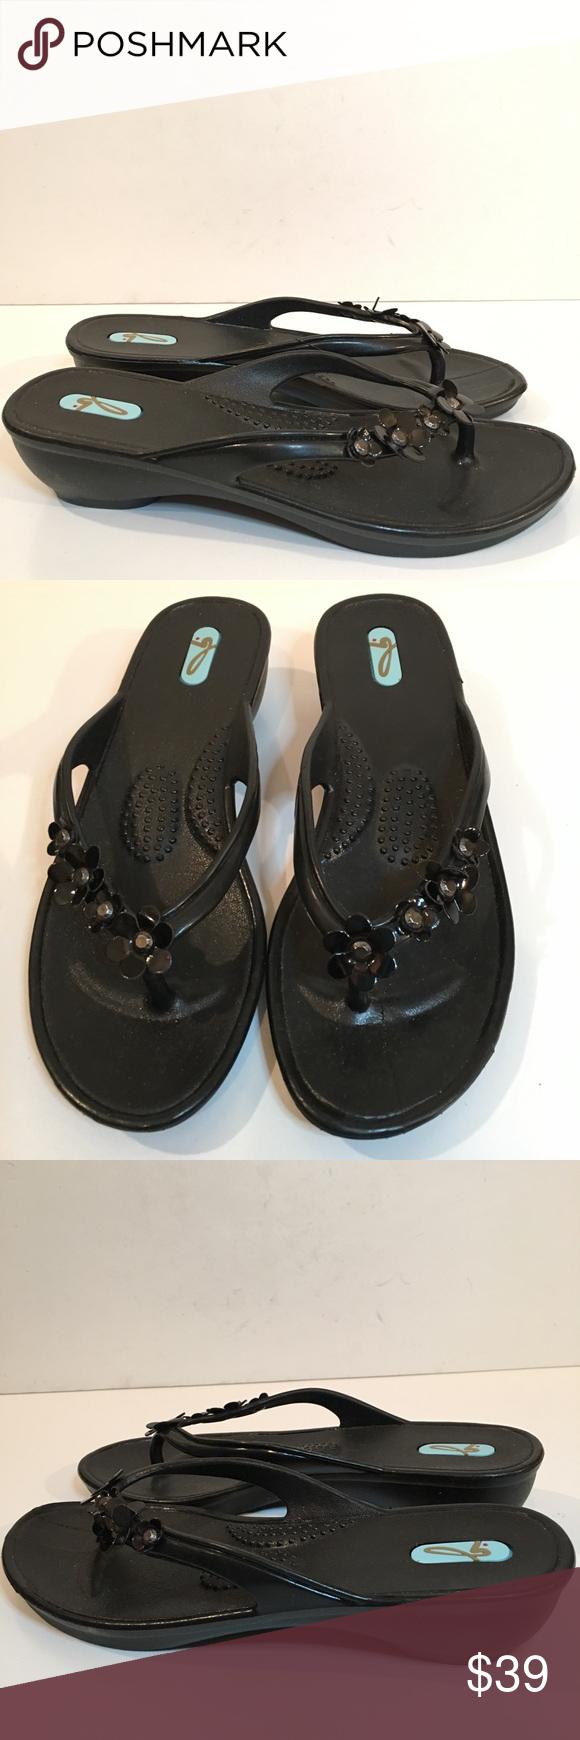 5ed723194ef4e1 New Oka B Sandles Size M 7-8 Floral Flip Flops.  shopmycloset  poshmark   fashion  shopping  style  forsale  OKA b.  Shoes